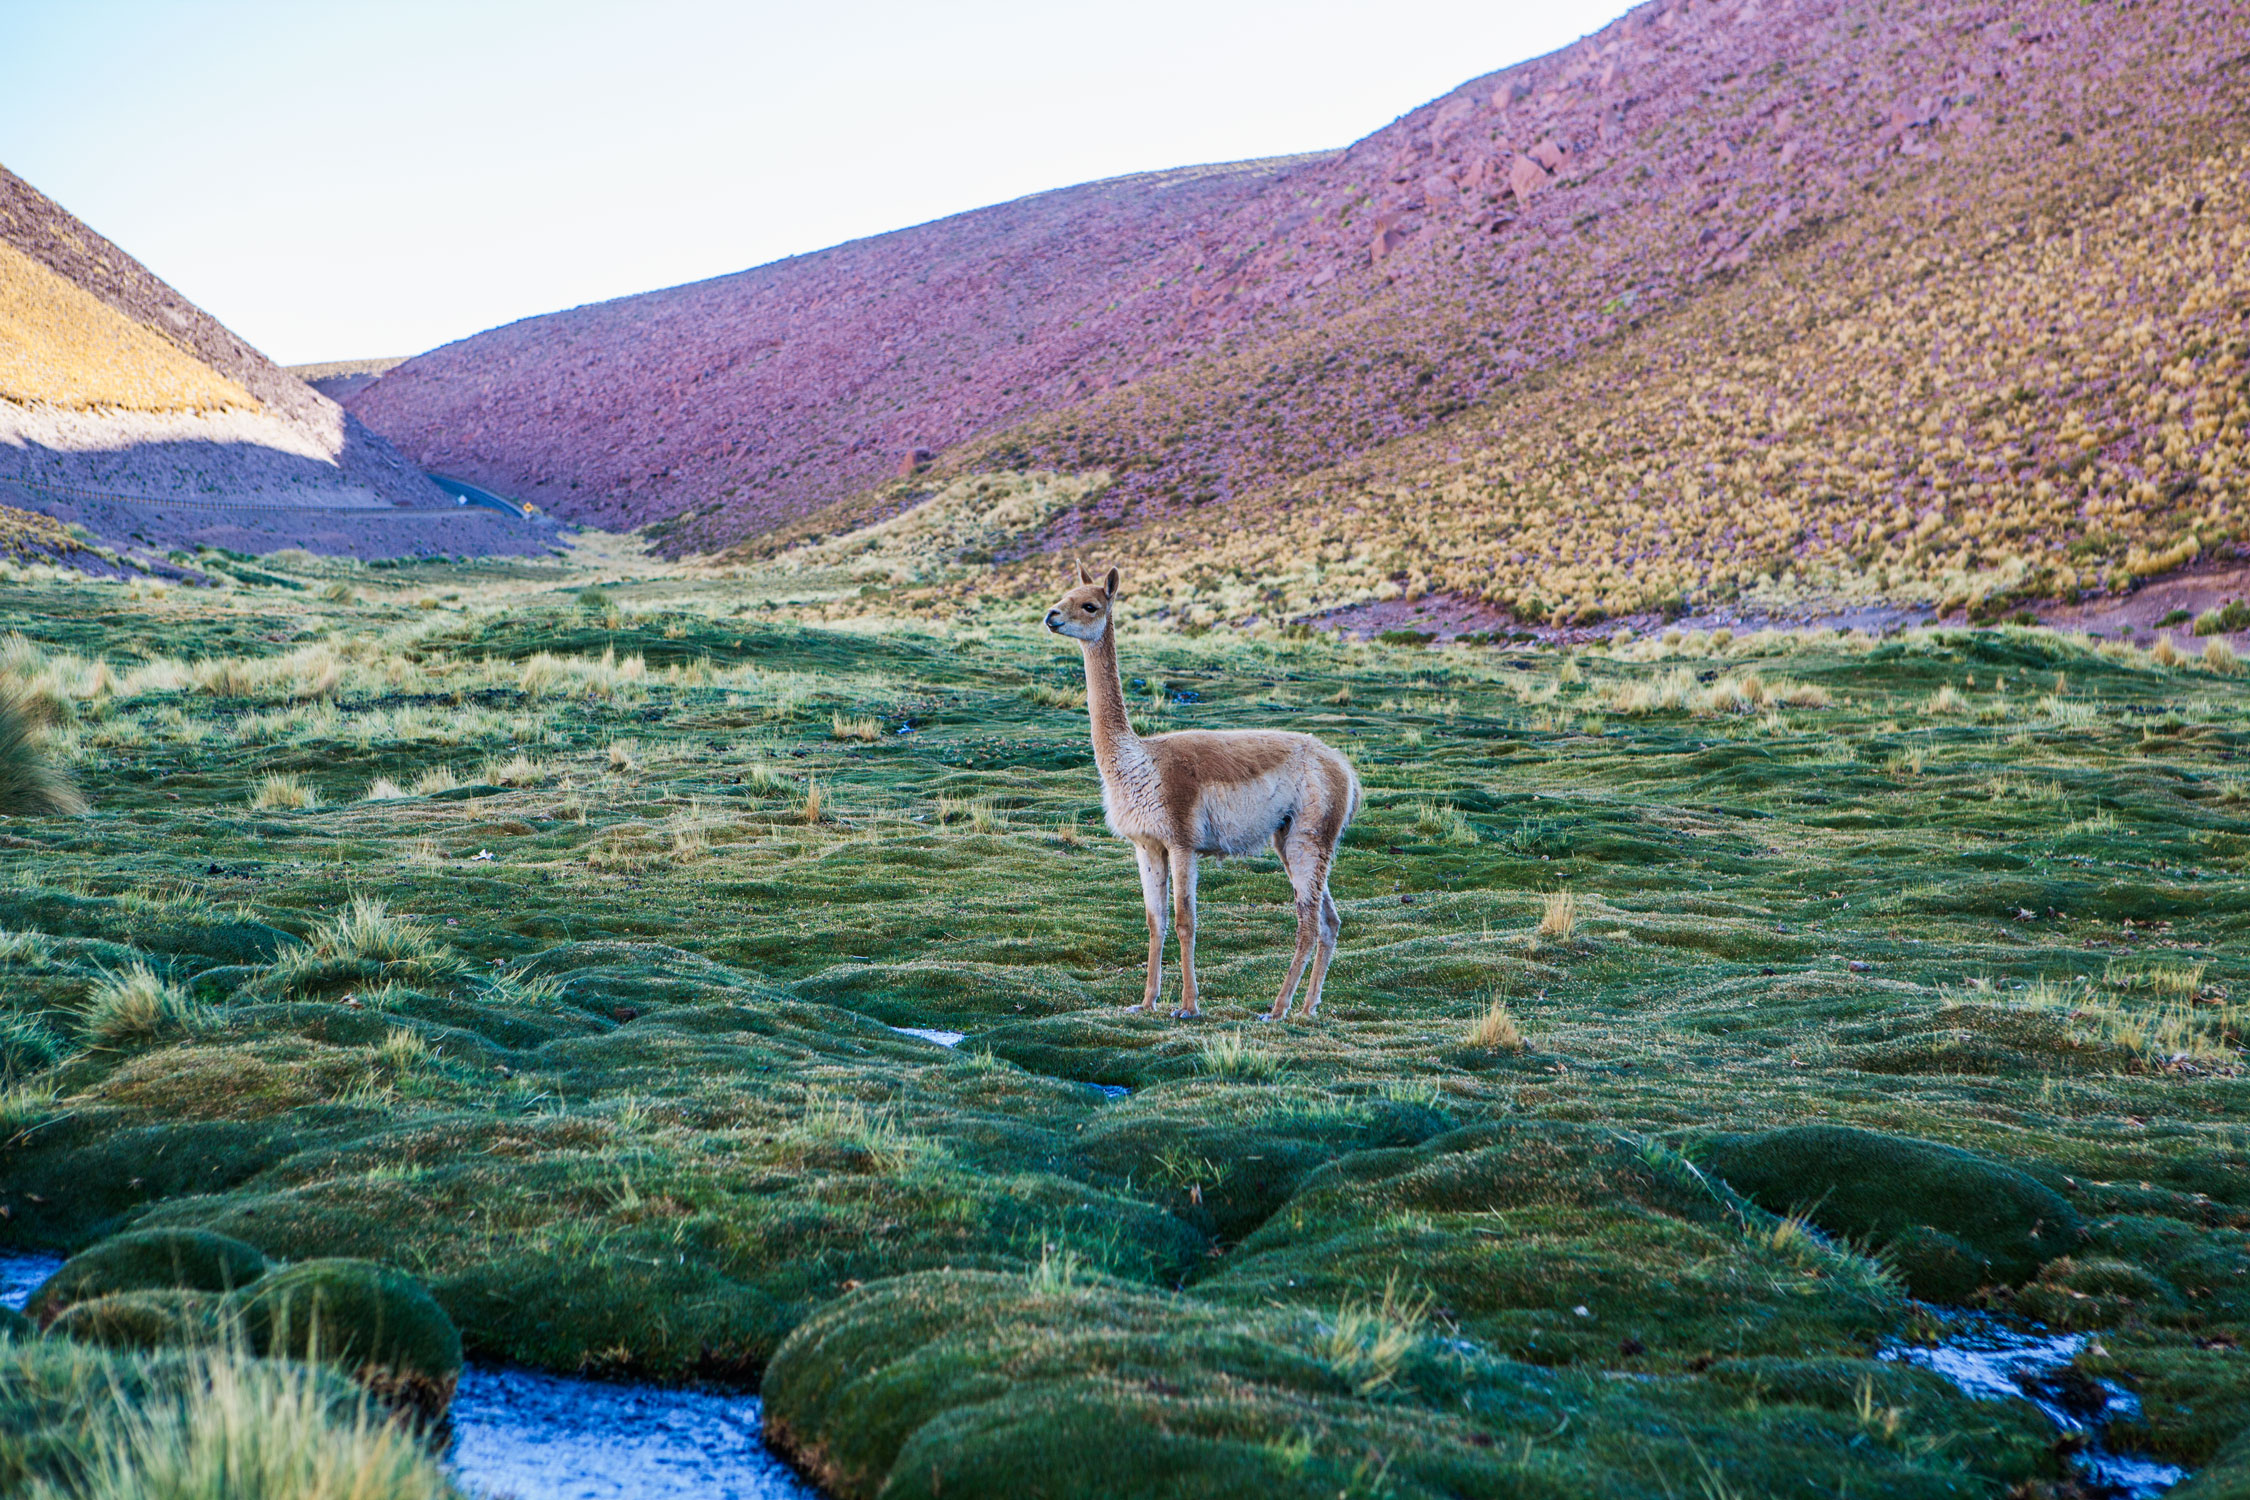 atacama-desert-chile-wander-south-animals-vicunas-1.jpg